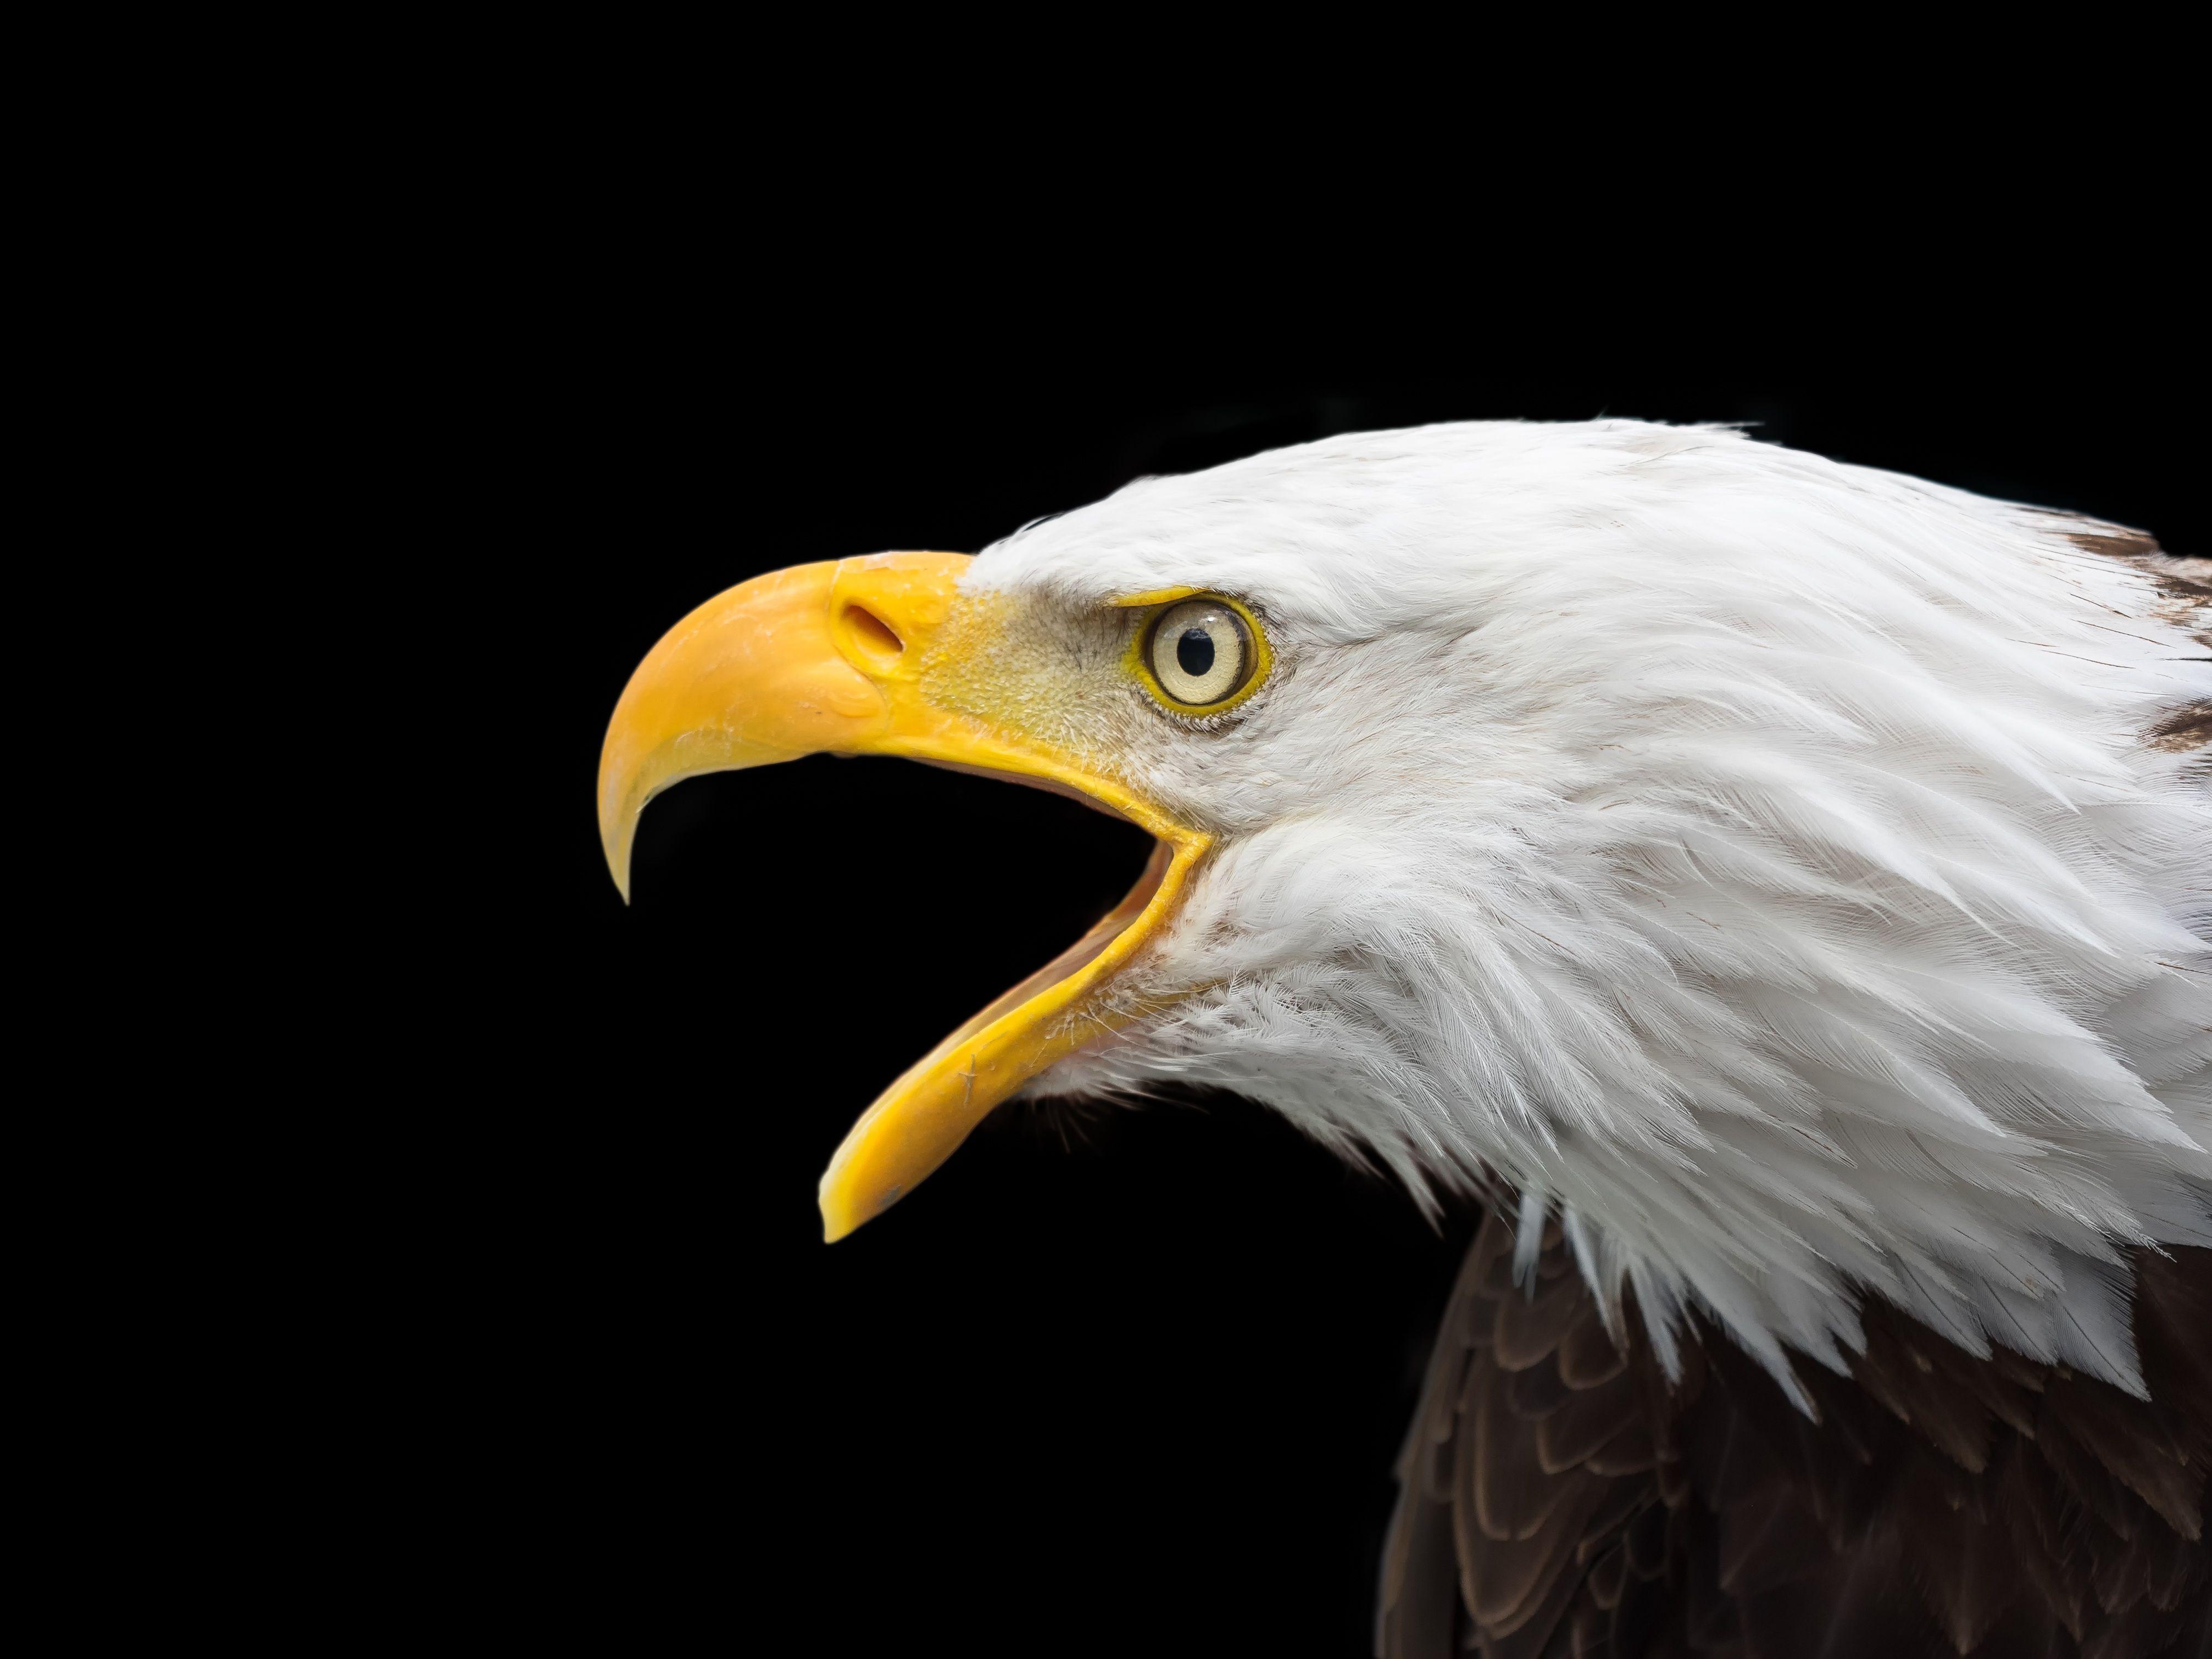 4K Eagle Wallpapers - Top Free 4K Eagle Backgrounds ...